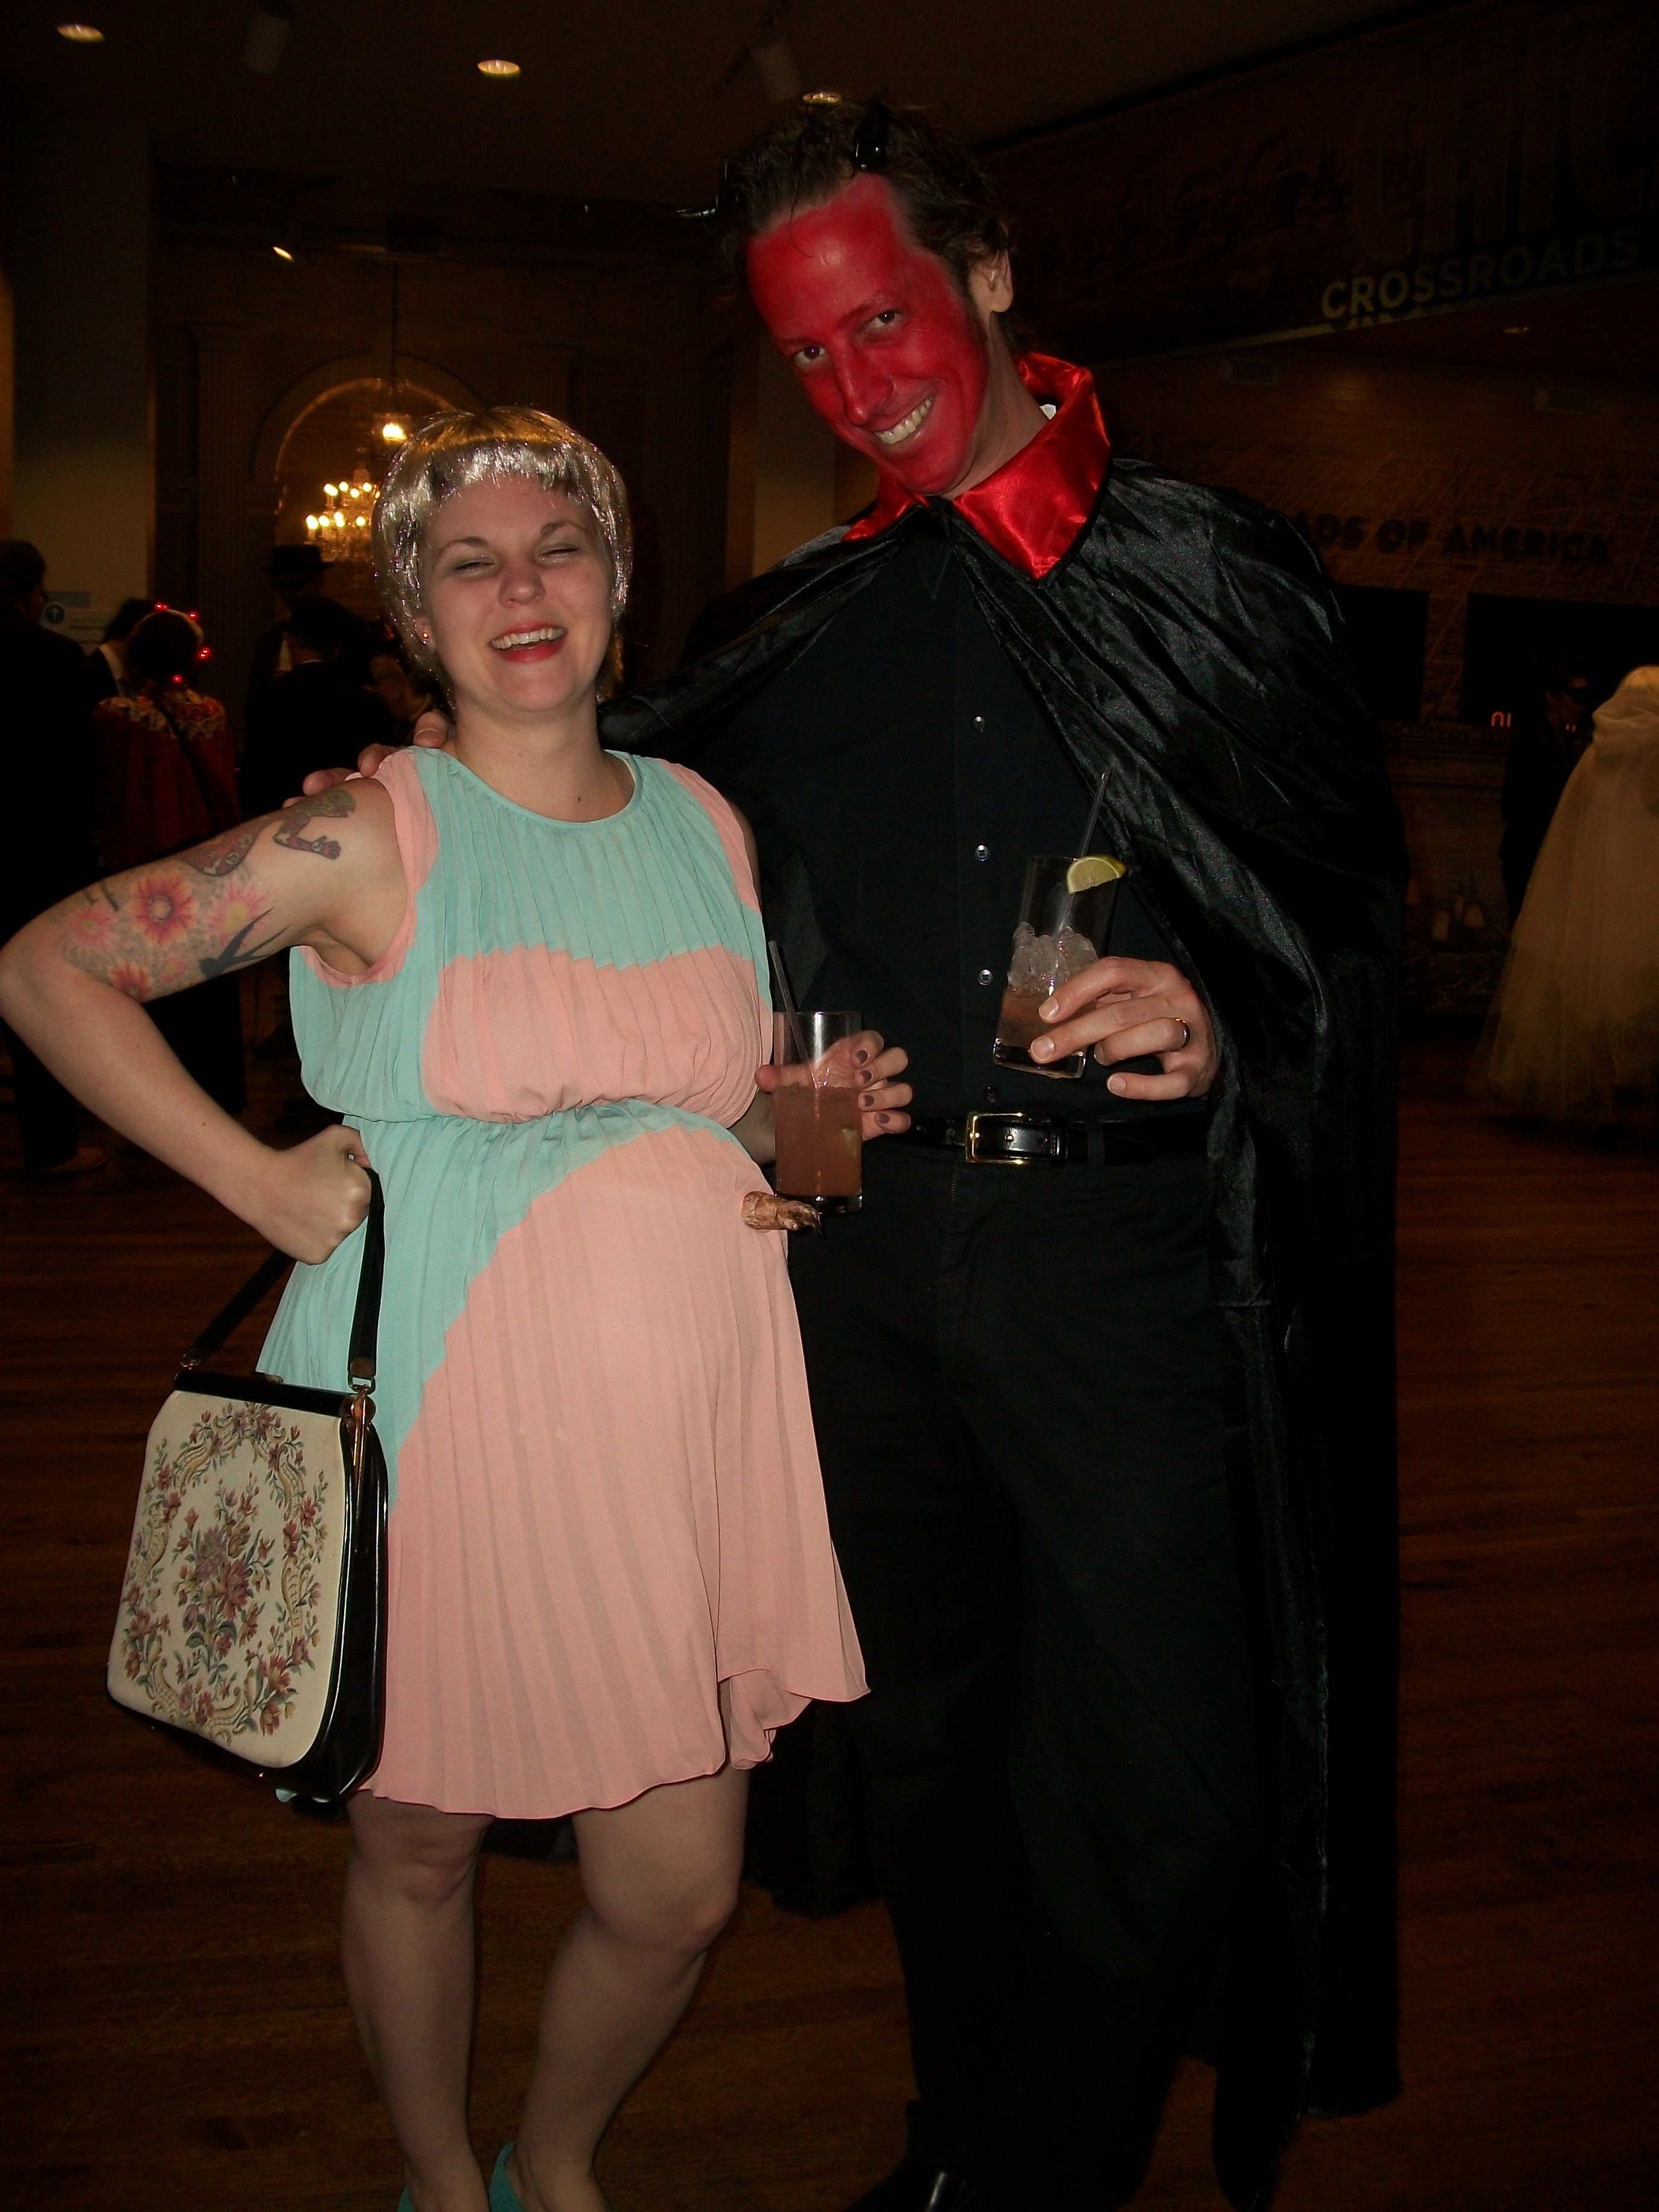 Halloween Post No. 2: Costume-o-Rama | White City Cinema